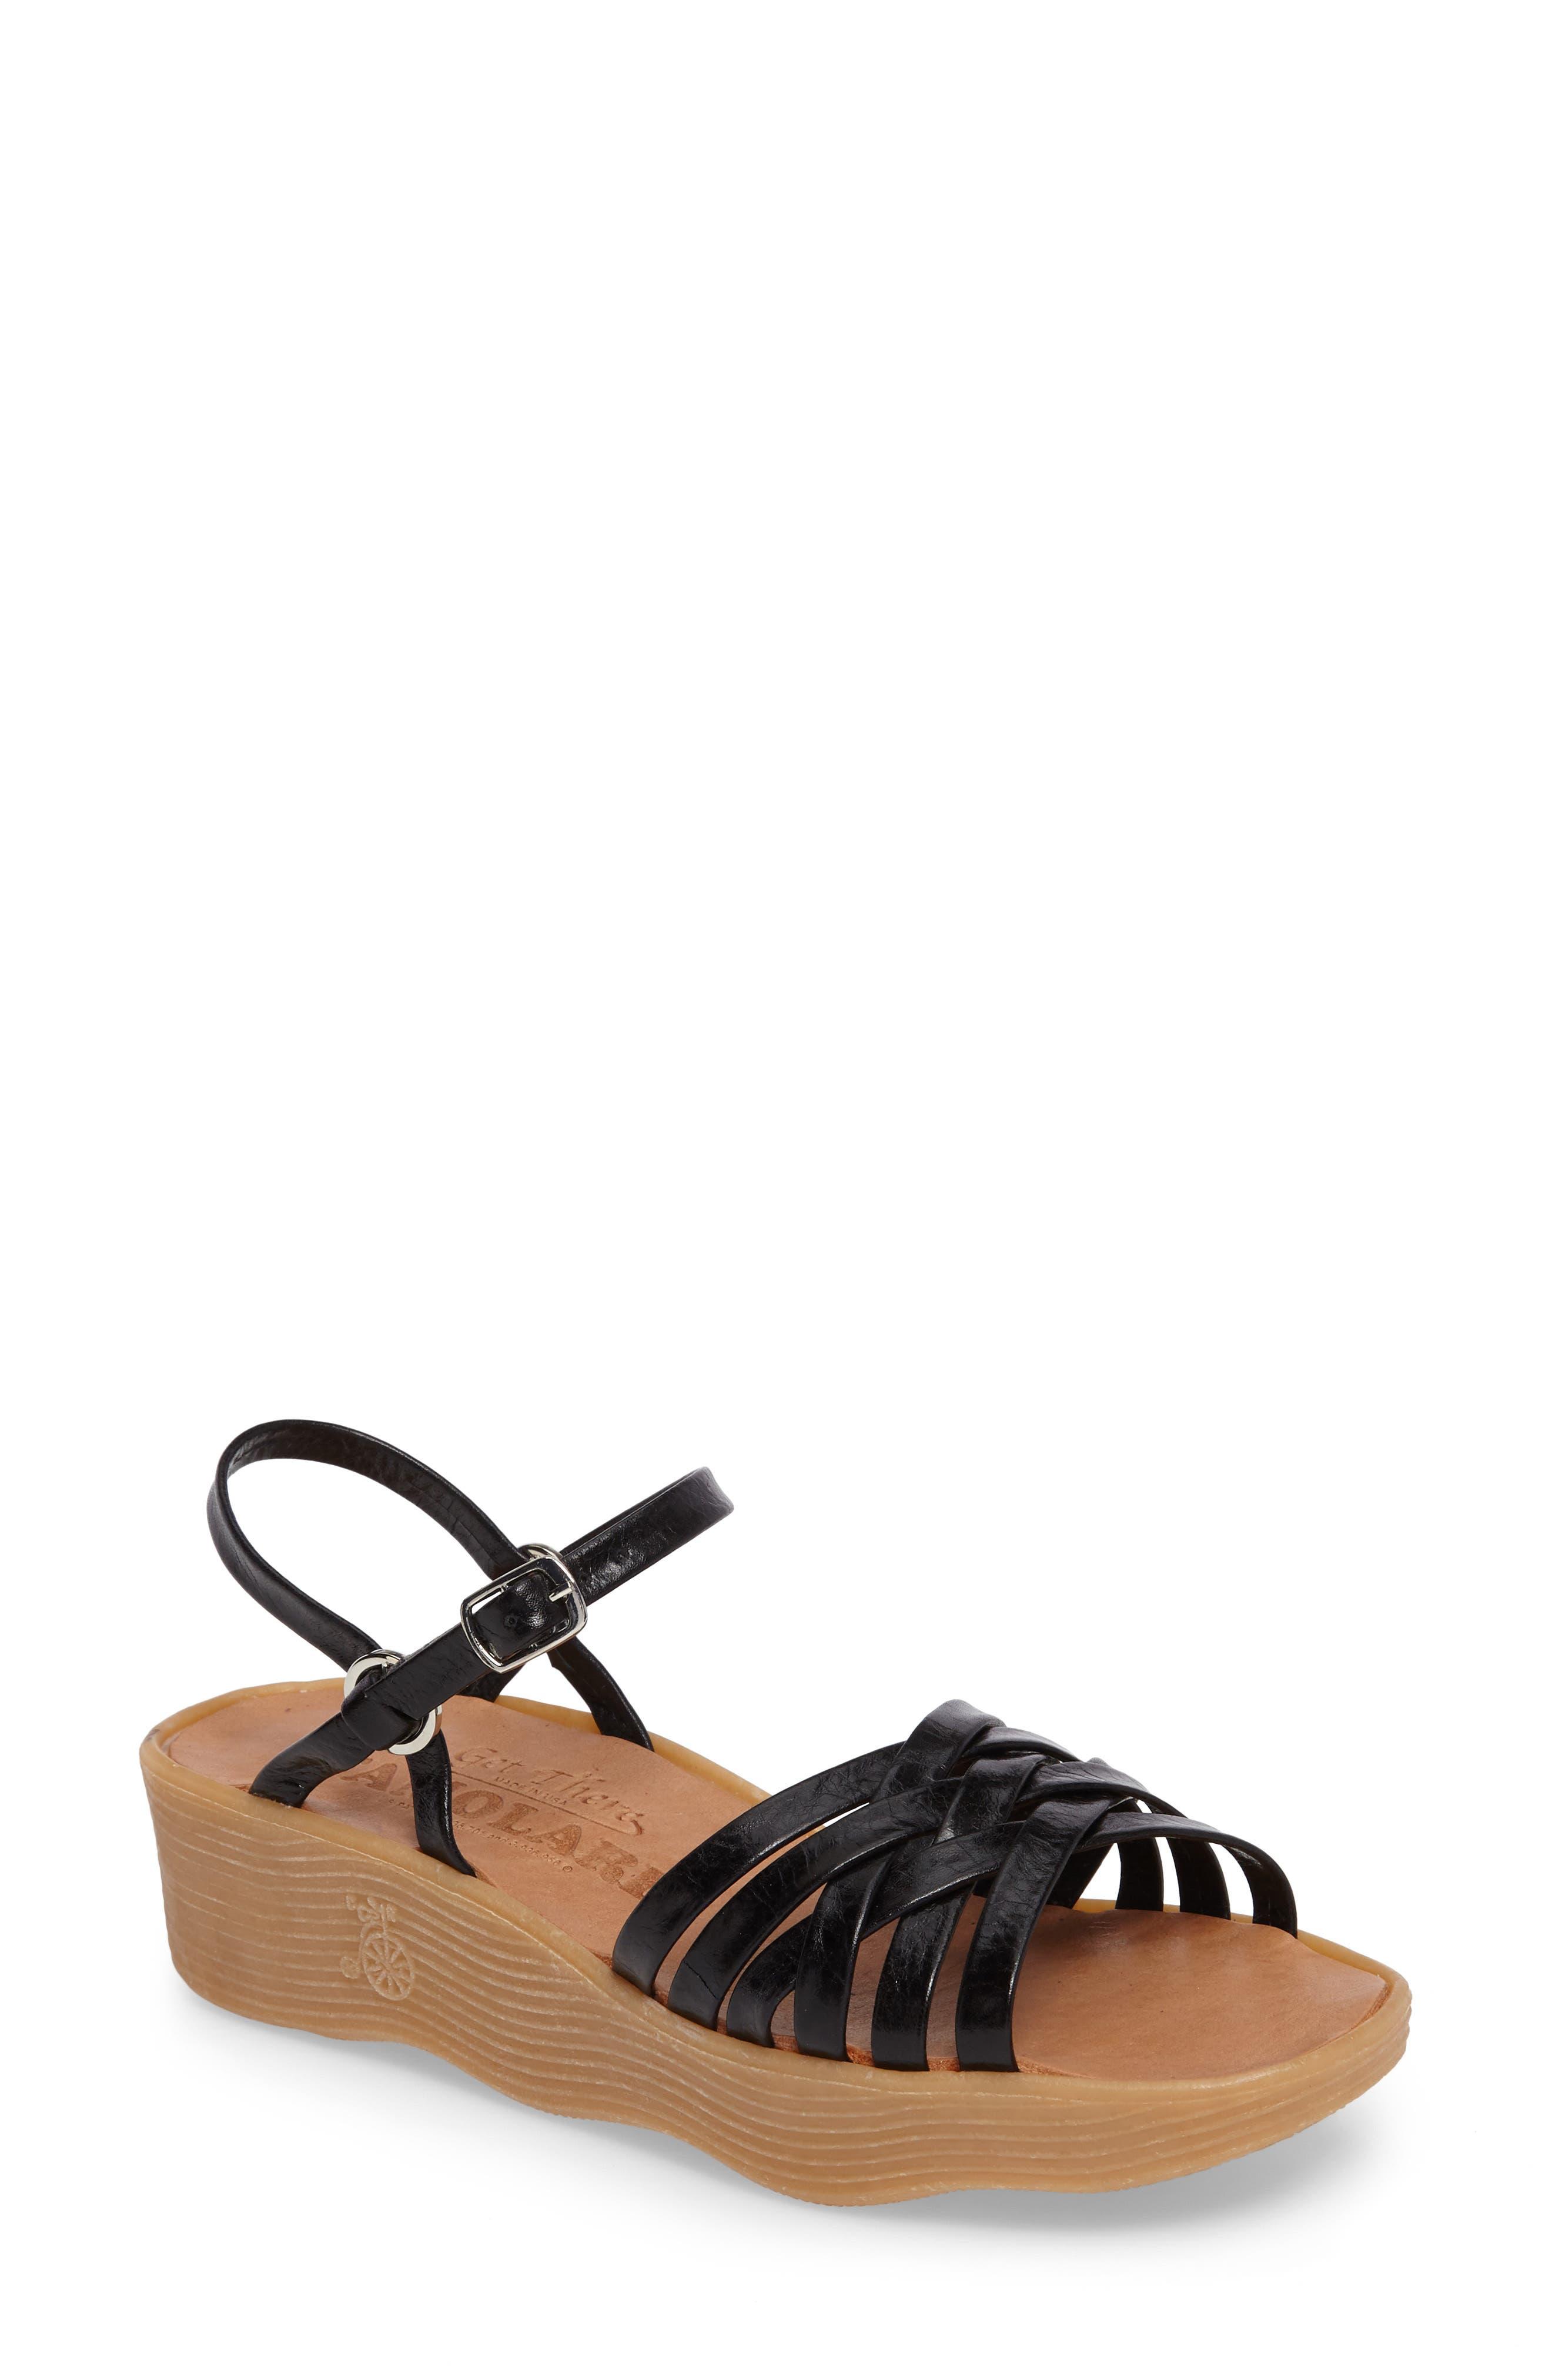 Alternate Image 1 Selected - Famolare Strappy Camper Sandal (Women)